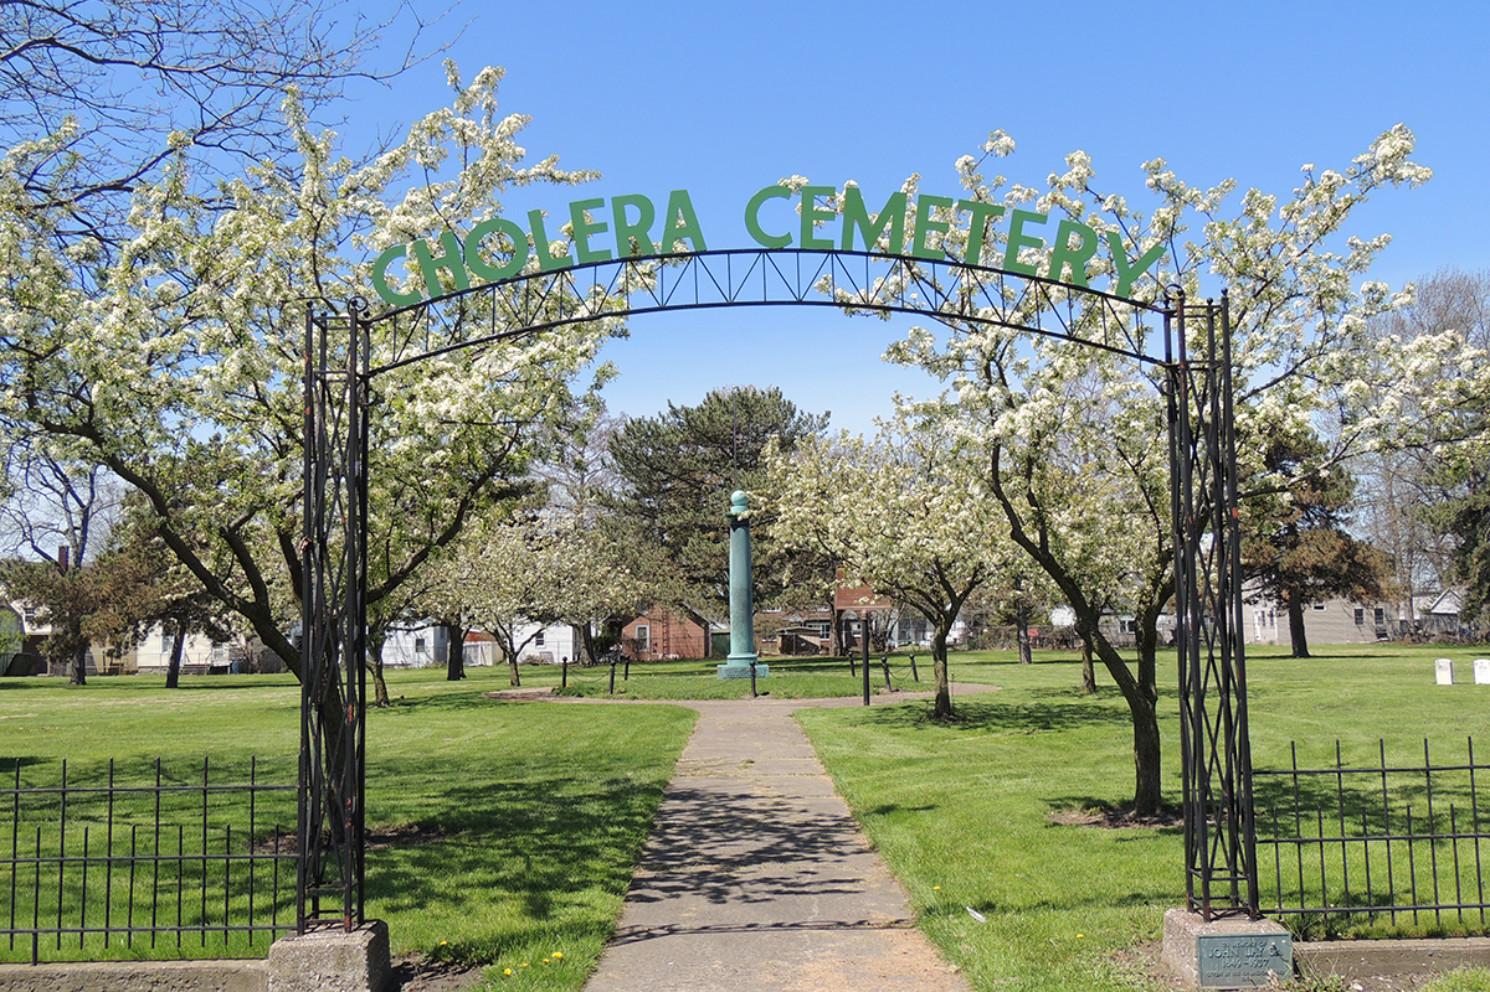 Cholera Cemetery Walk